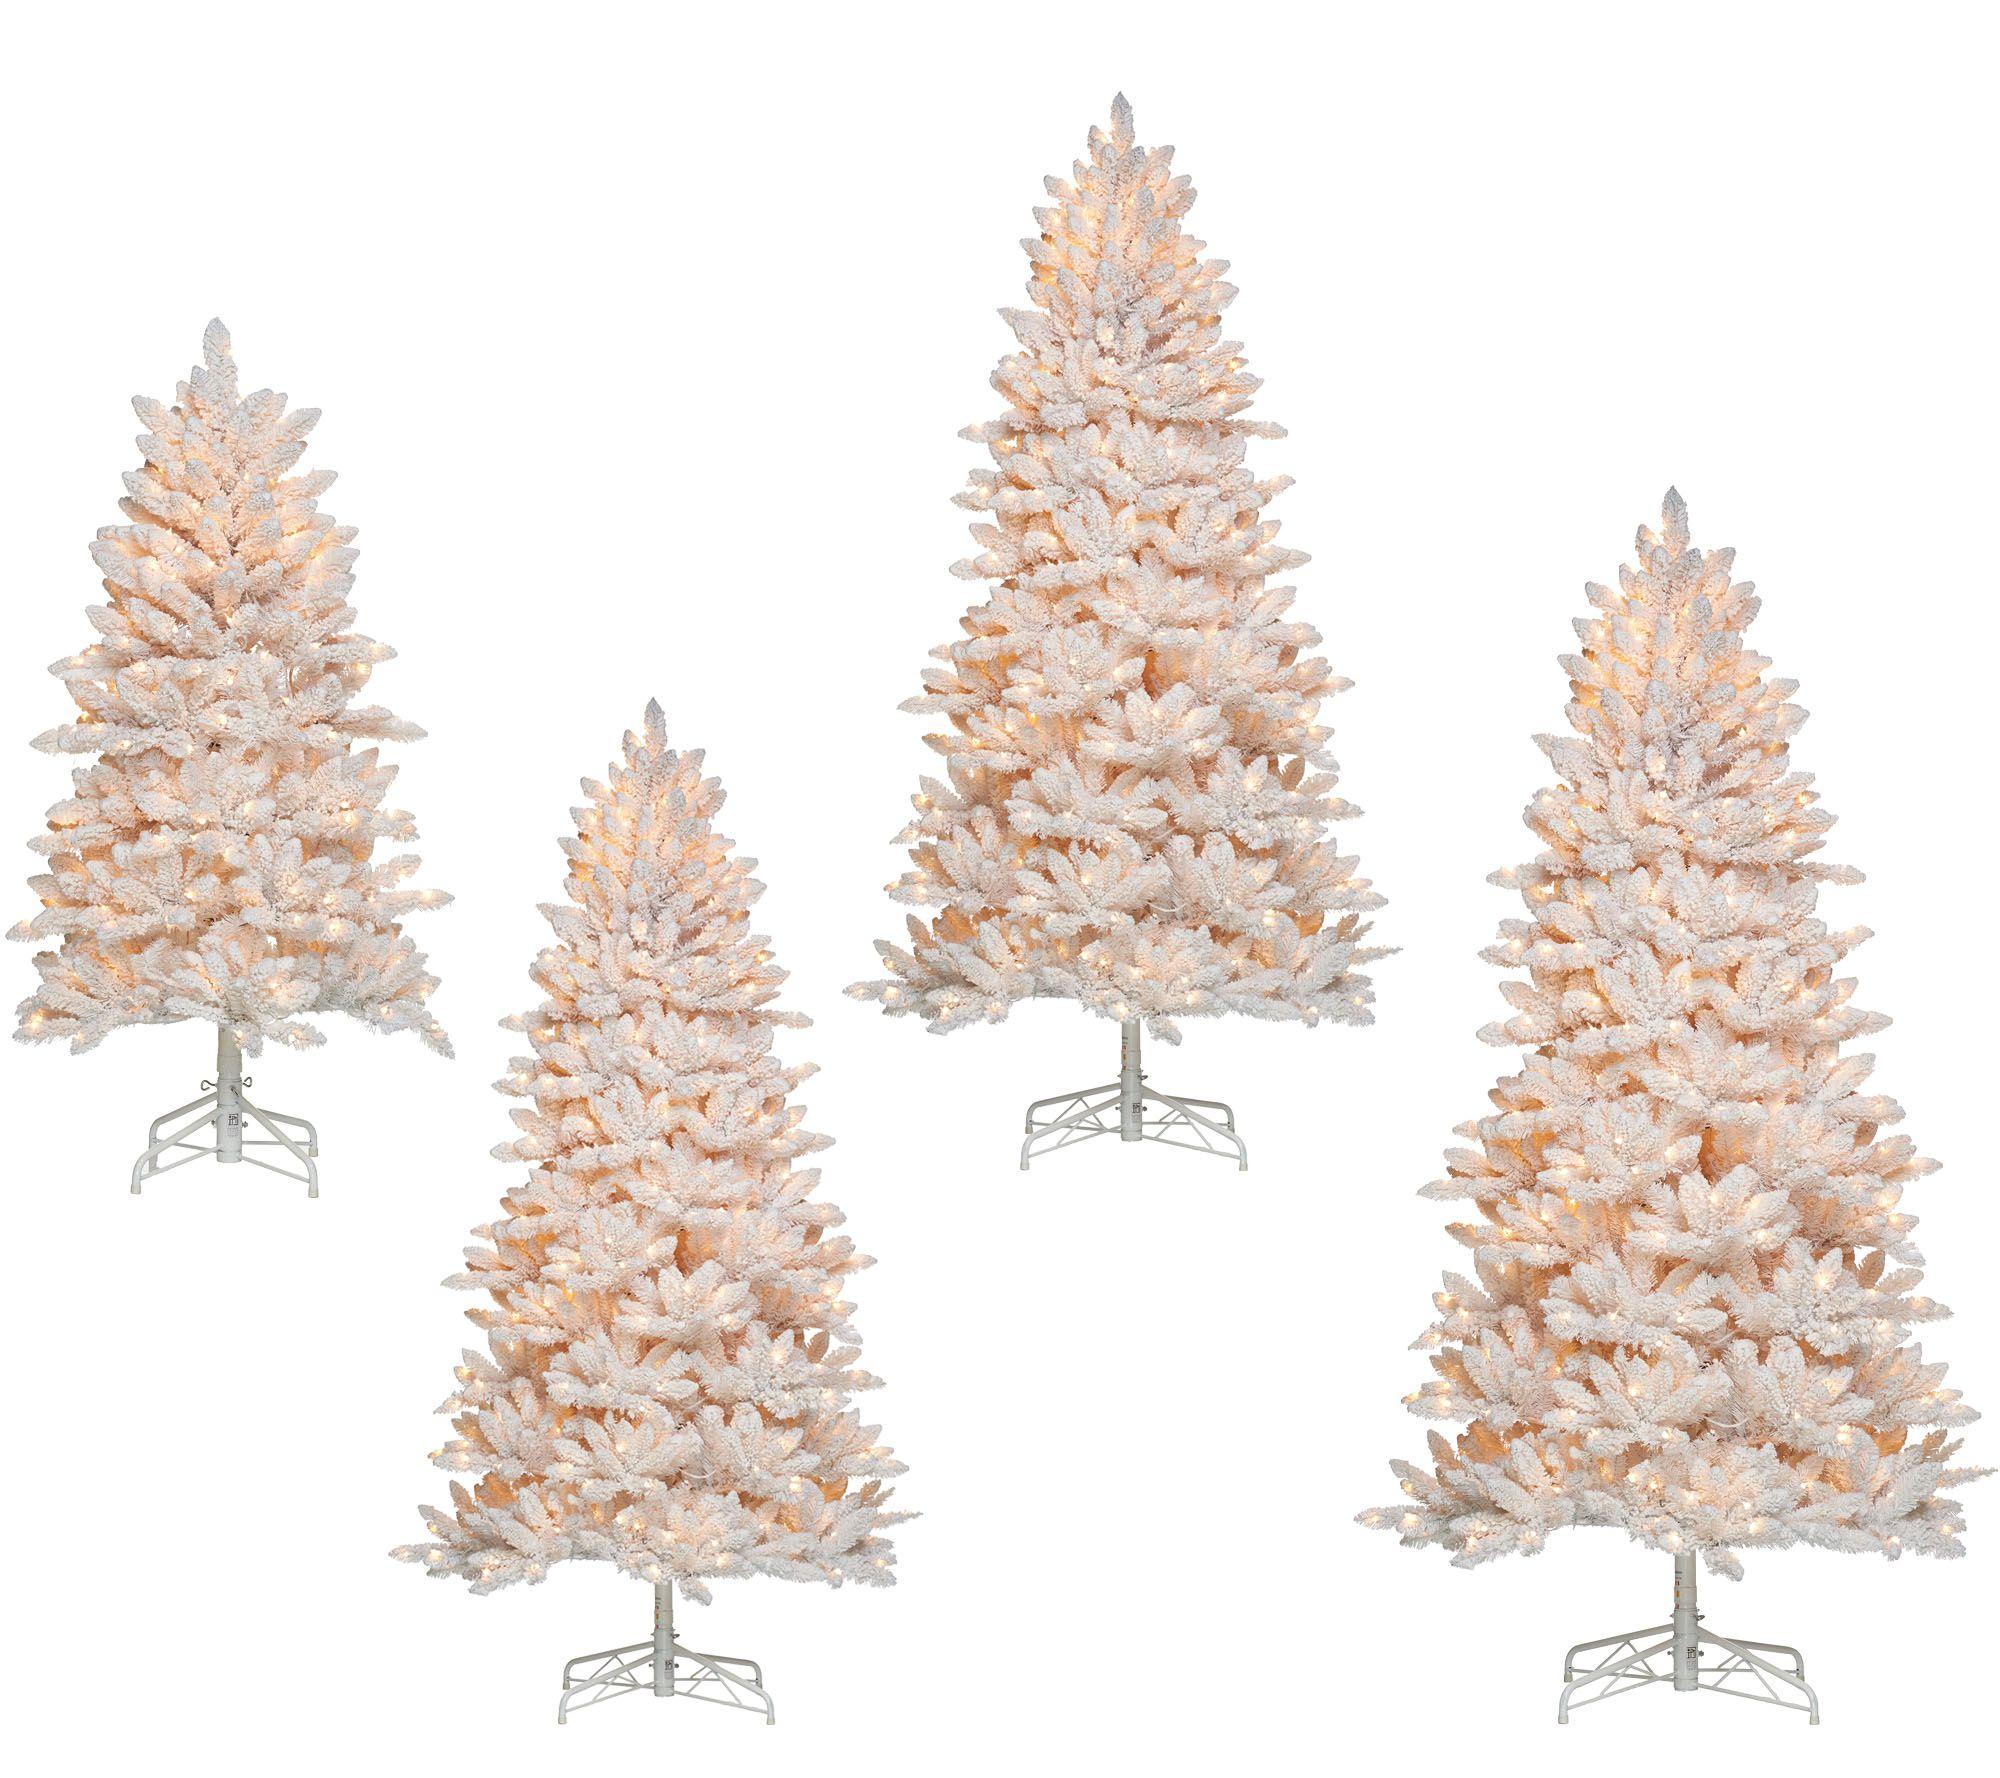 Bethlehem Lights Flocked Christmas Tree With Instant Power